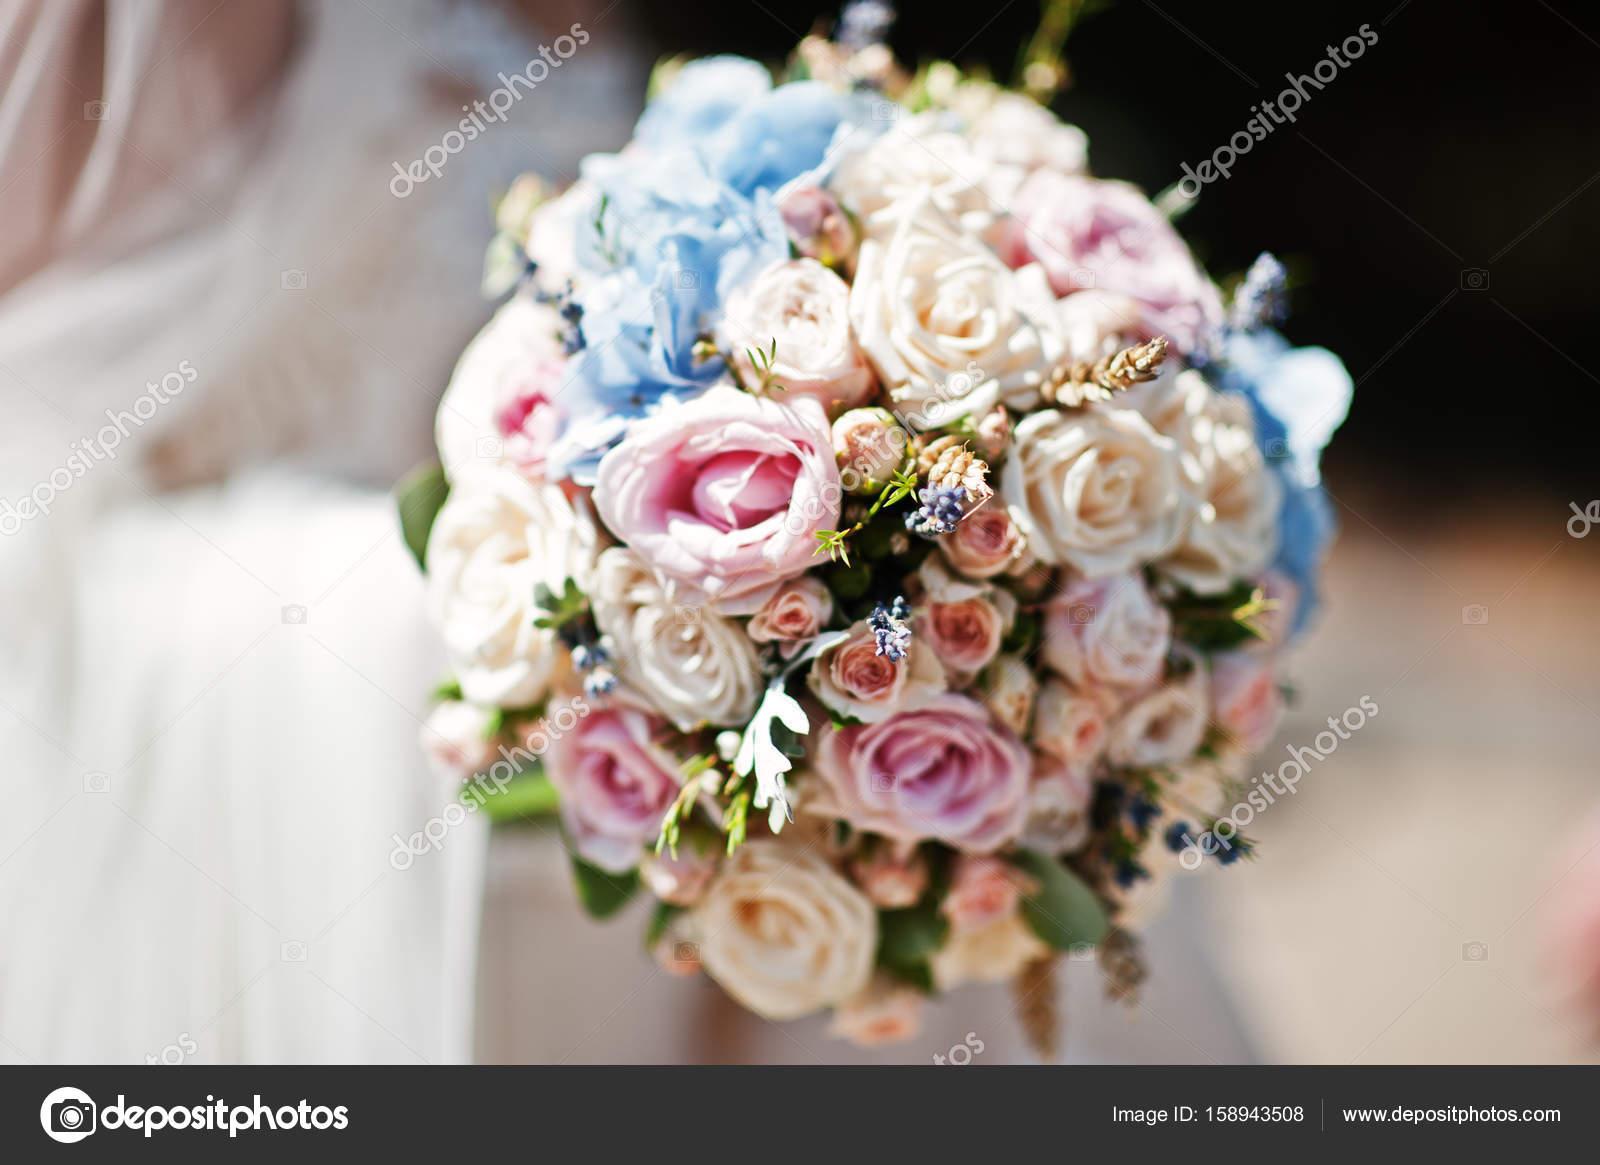 Amazing wedding bouquet made of roses hydrangeas and lavender i amazing wedding bouquet made of roses hydrangeas and lavender i stock photo izmirmasajfo